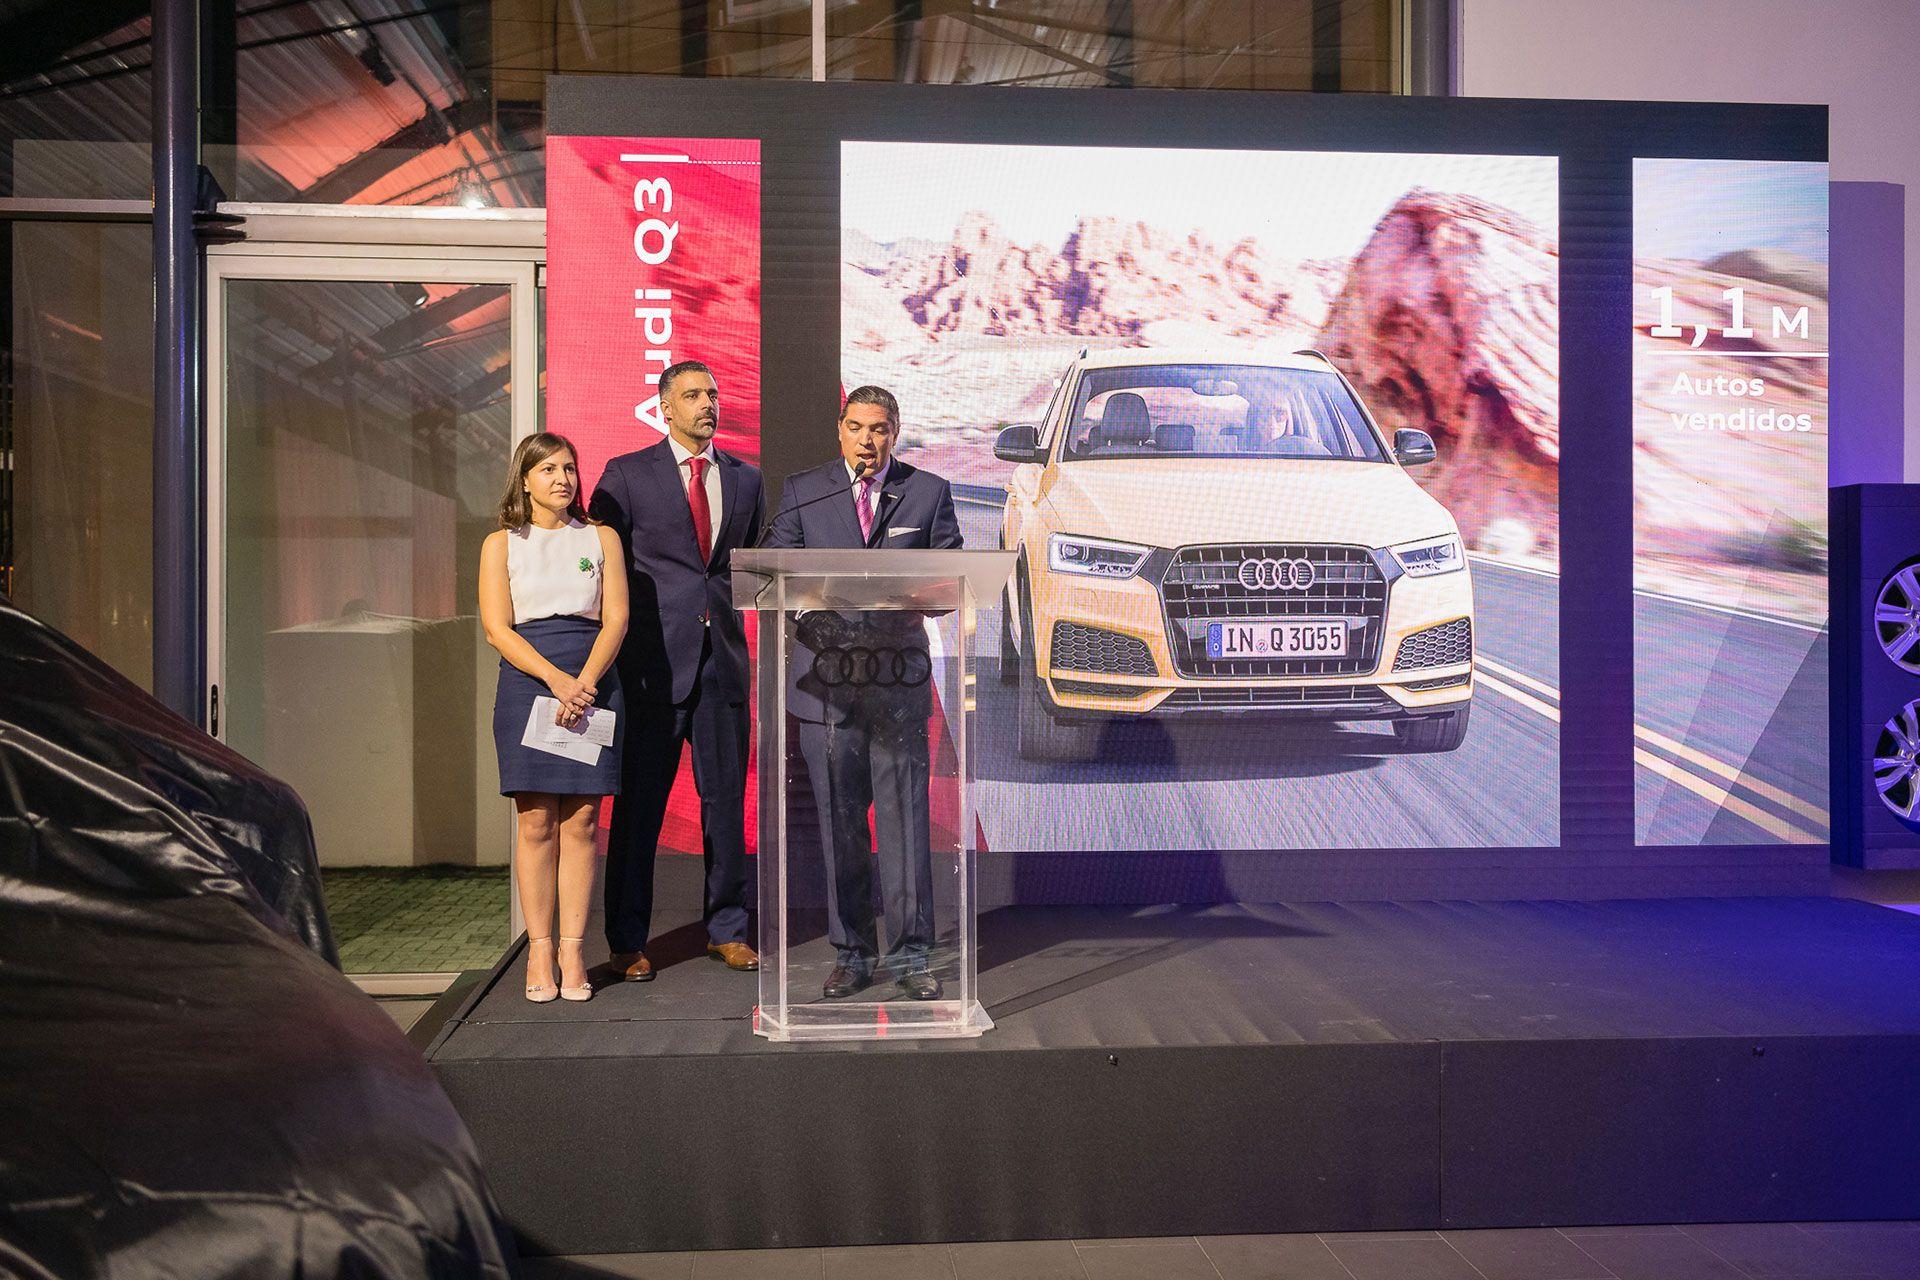 <p><strong>Avelino Abreu presenta el nuevo Audi Q3 Sportback</strong></p>